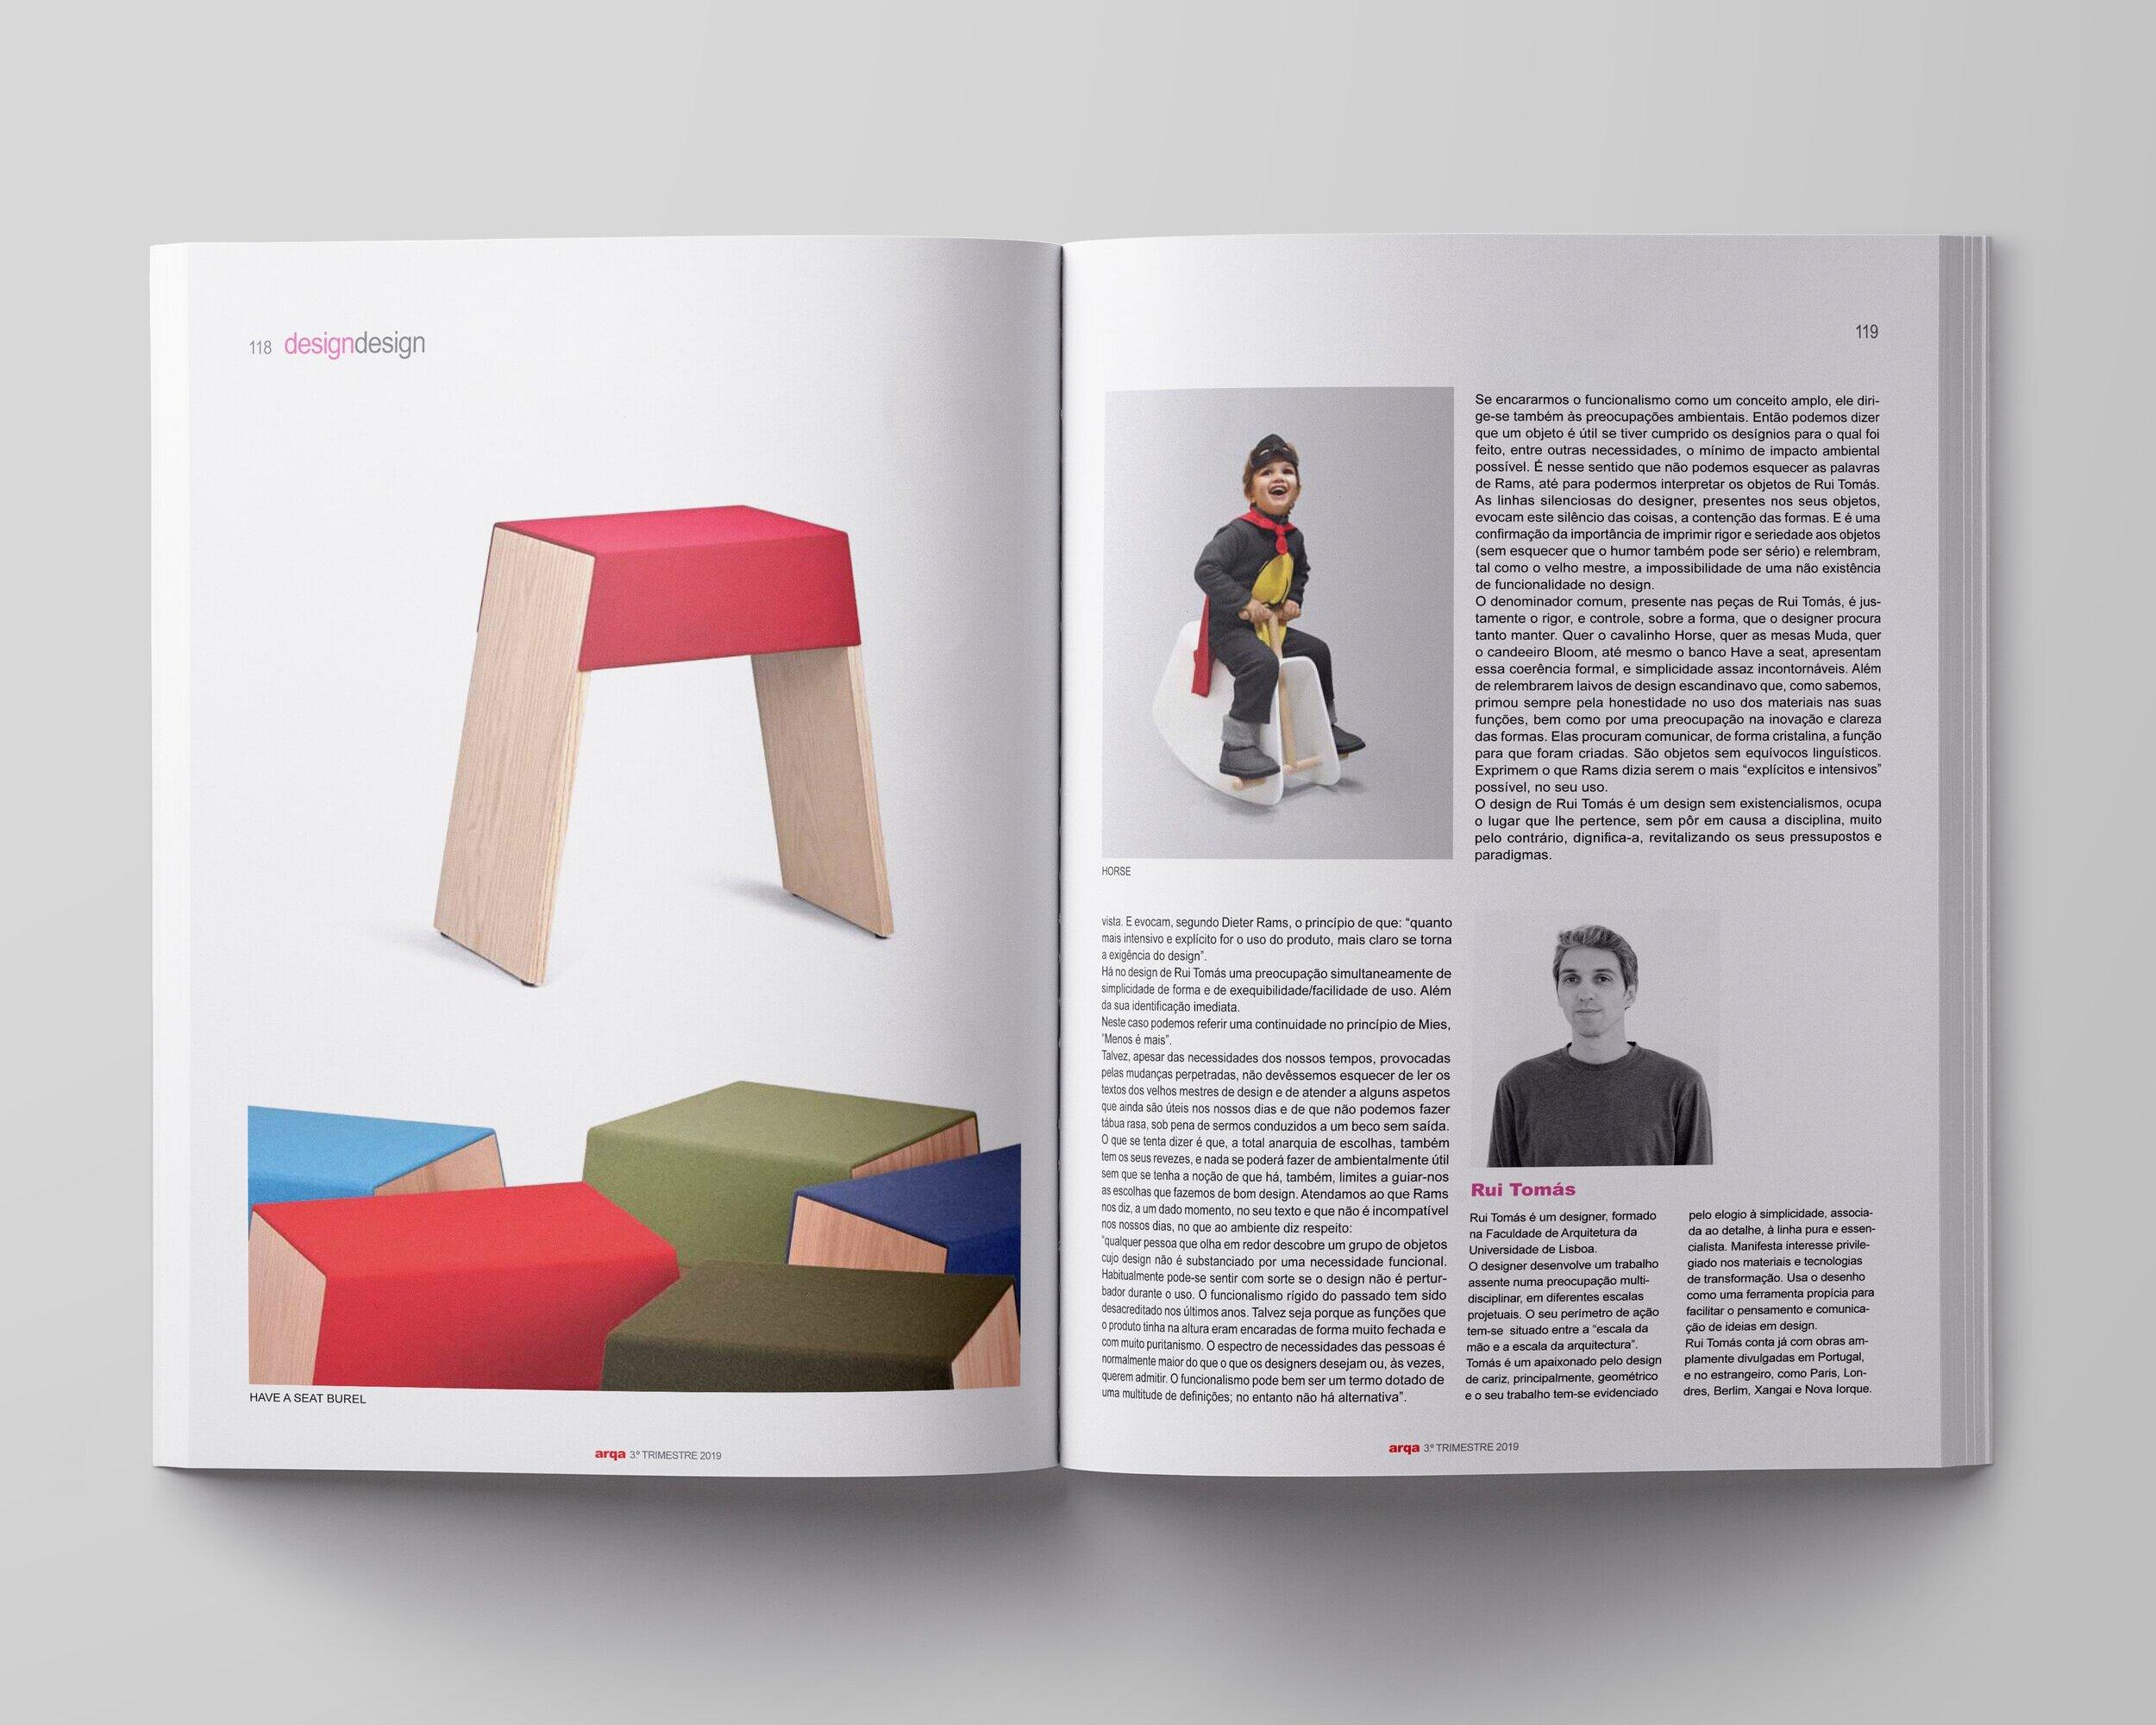 Design Rui Tomas ARQA 05.jpg